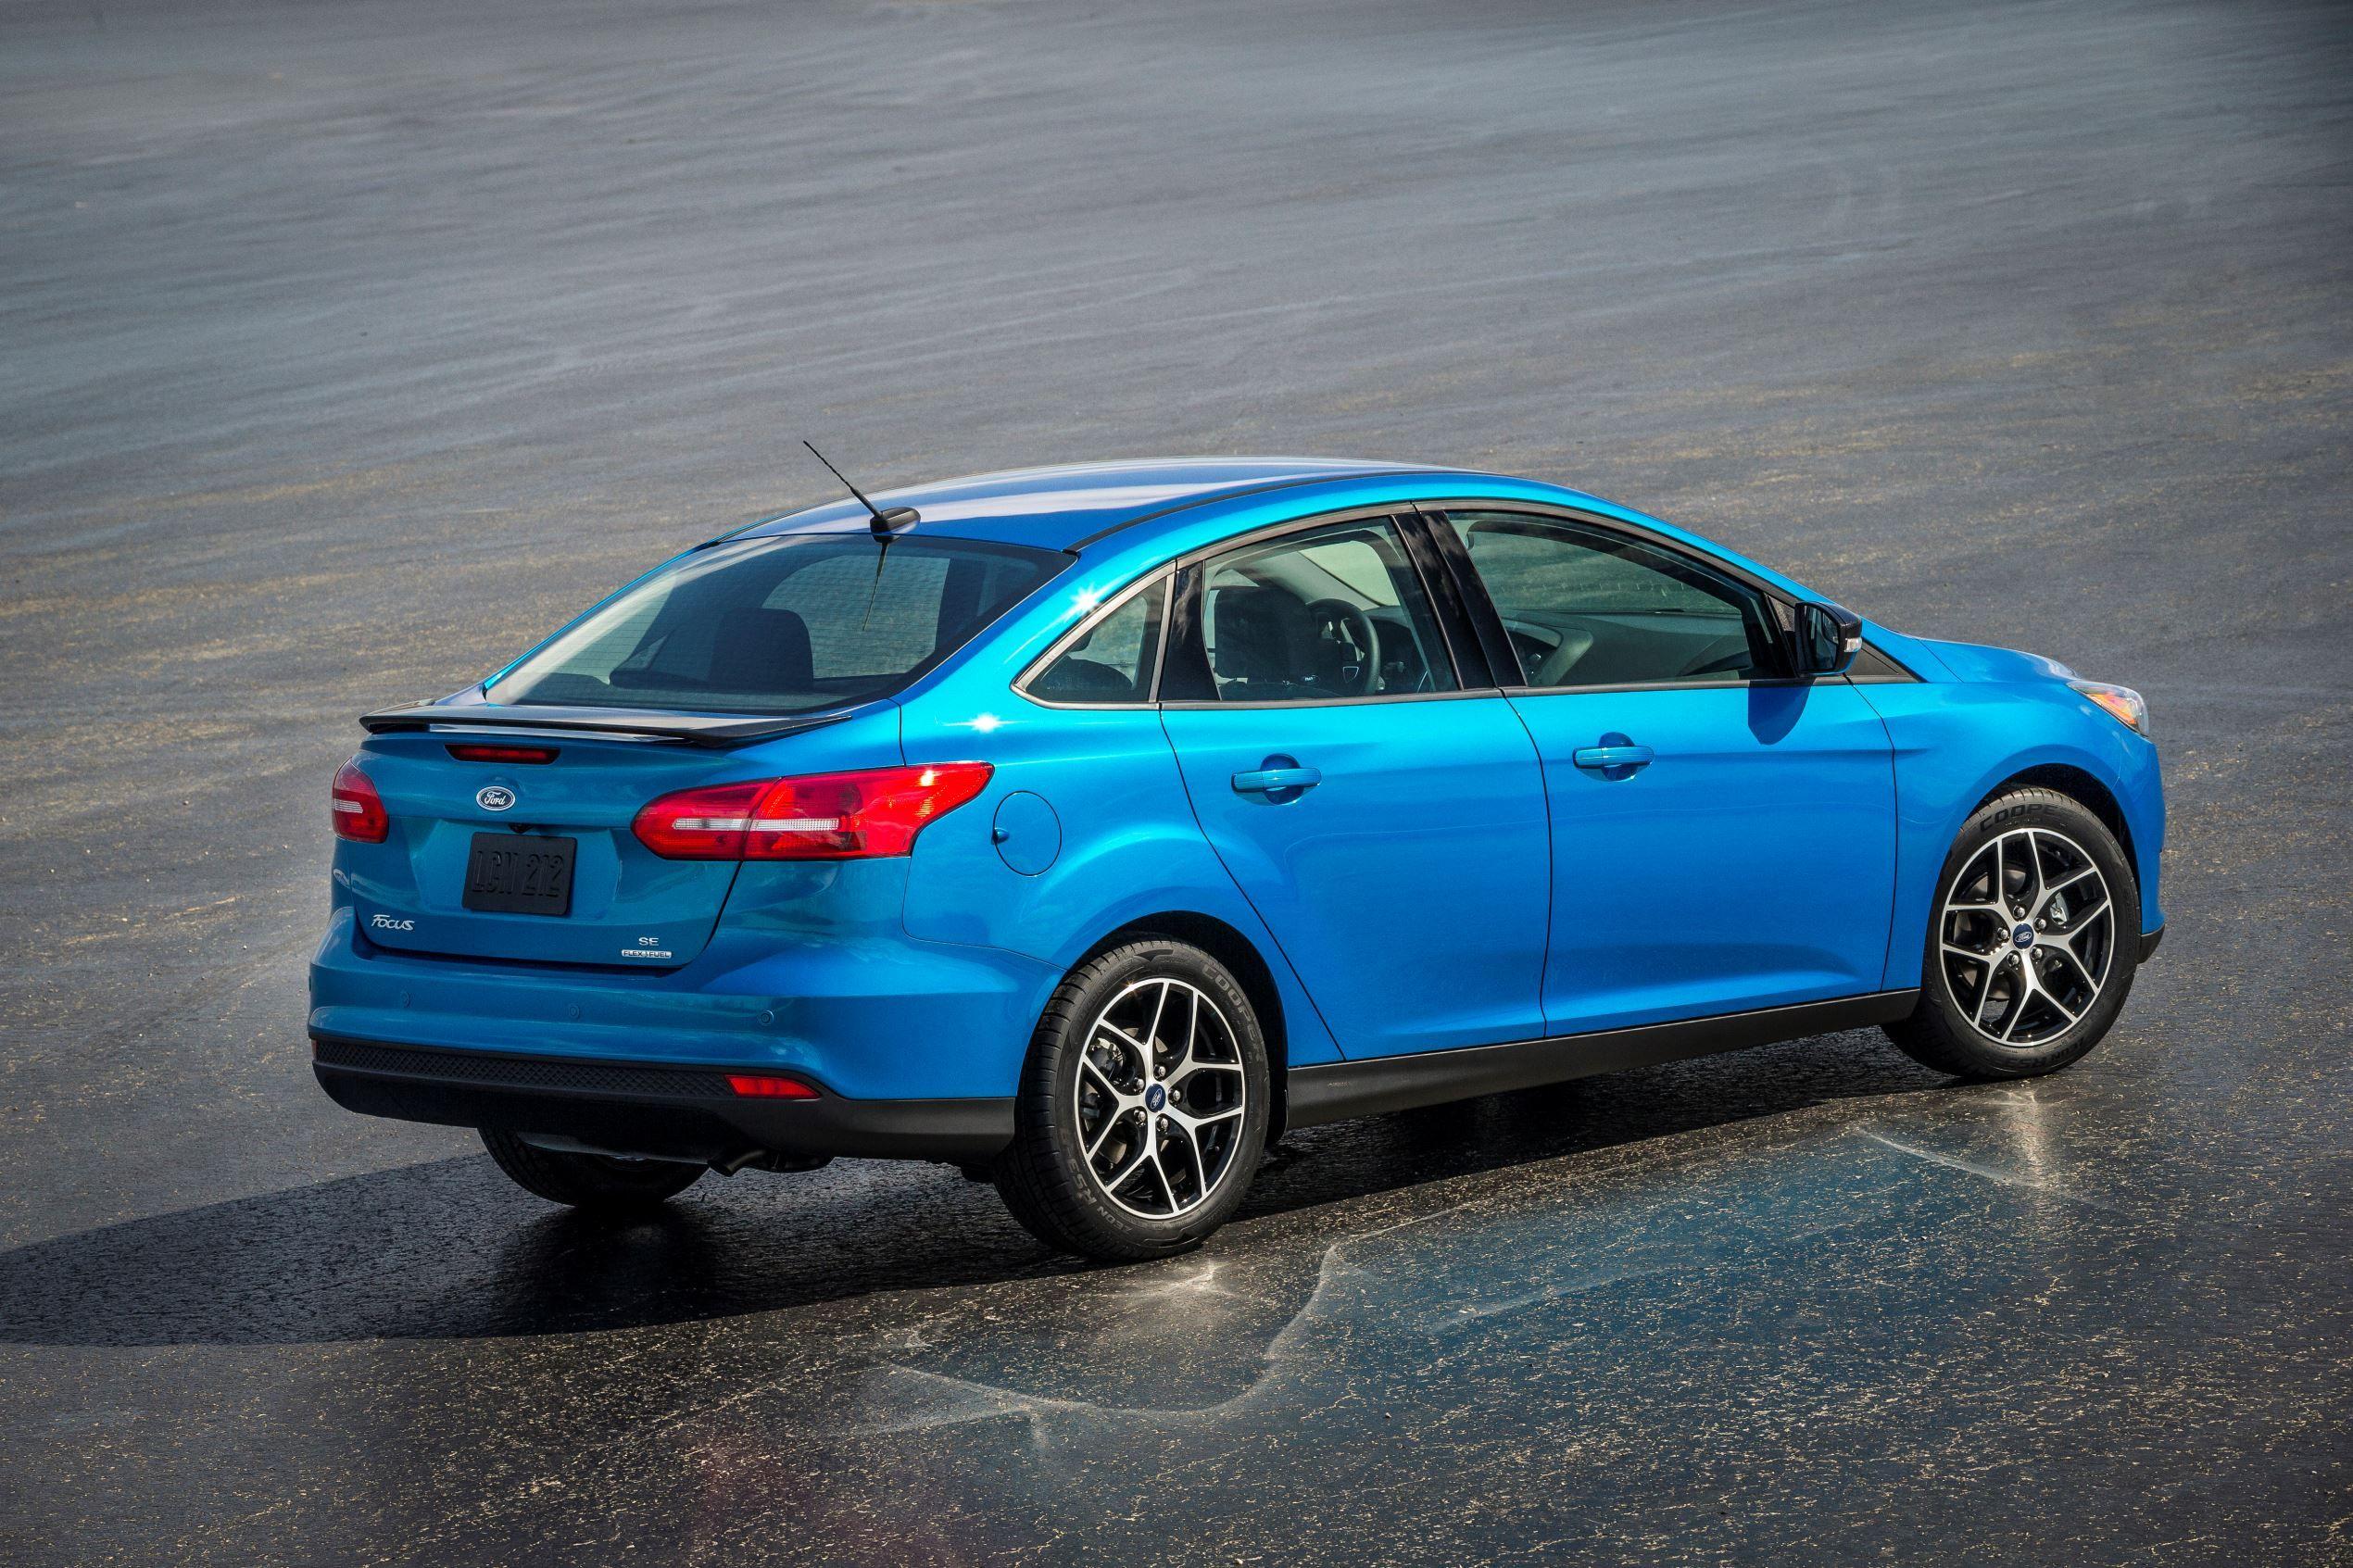 Highest Scoring American Vehicles Ford Focus Ford Focus Sedan Compare Cars